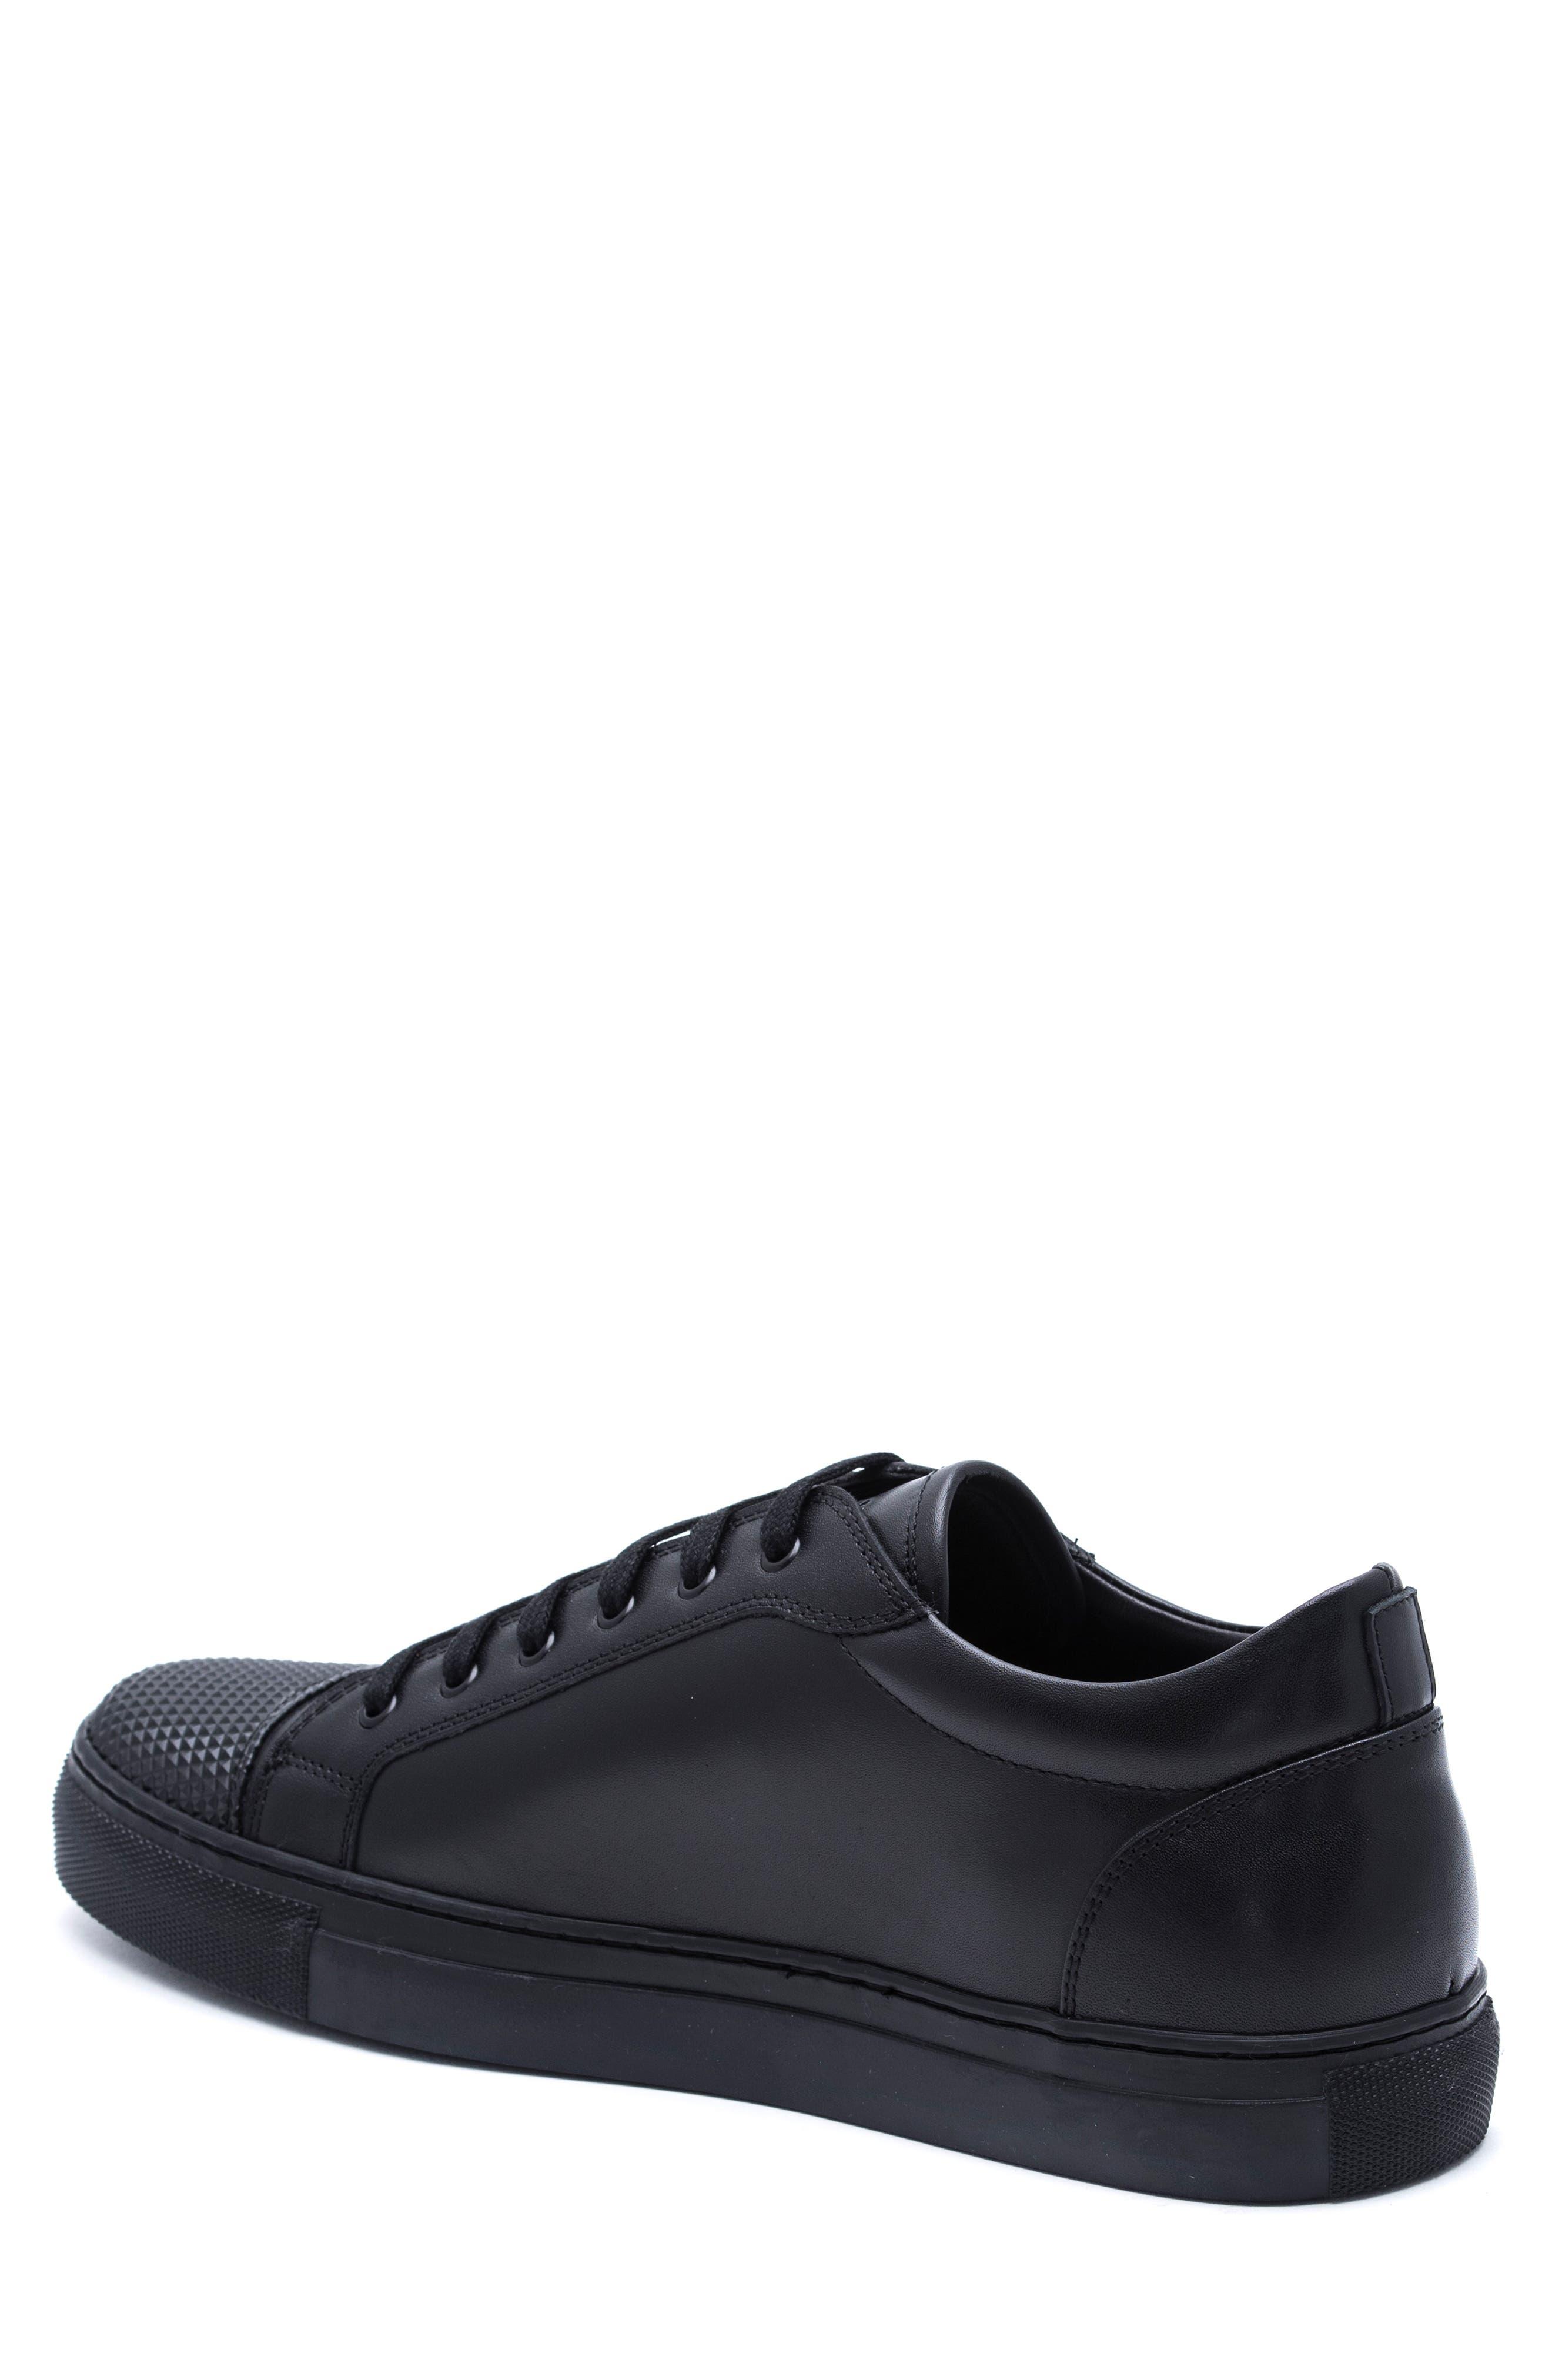 John Sneaker,                             Alternate thumbnail 2, color,                             Black